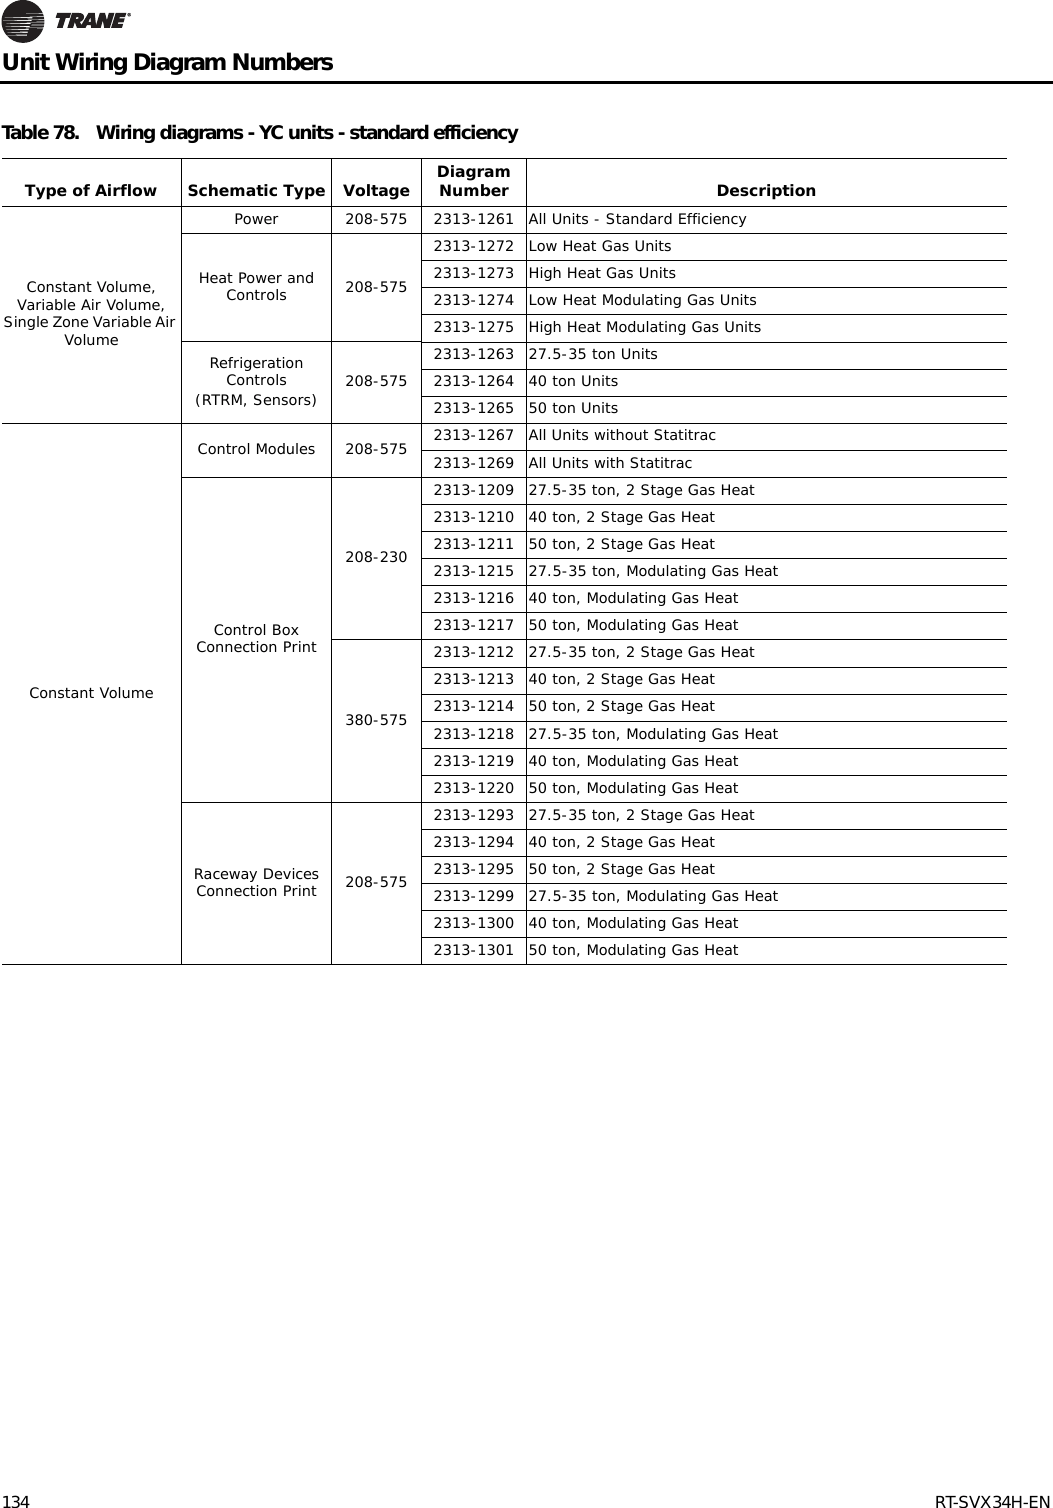 Maystar Mca 730 Wiring Diagram